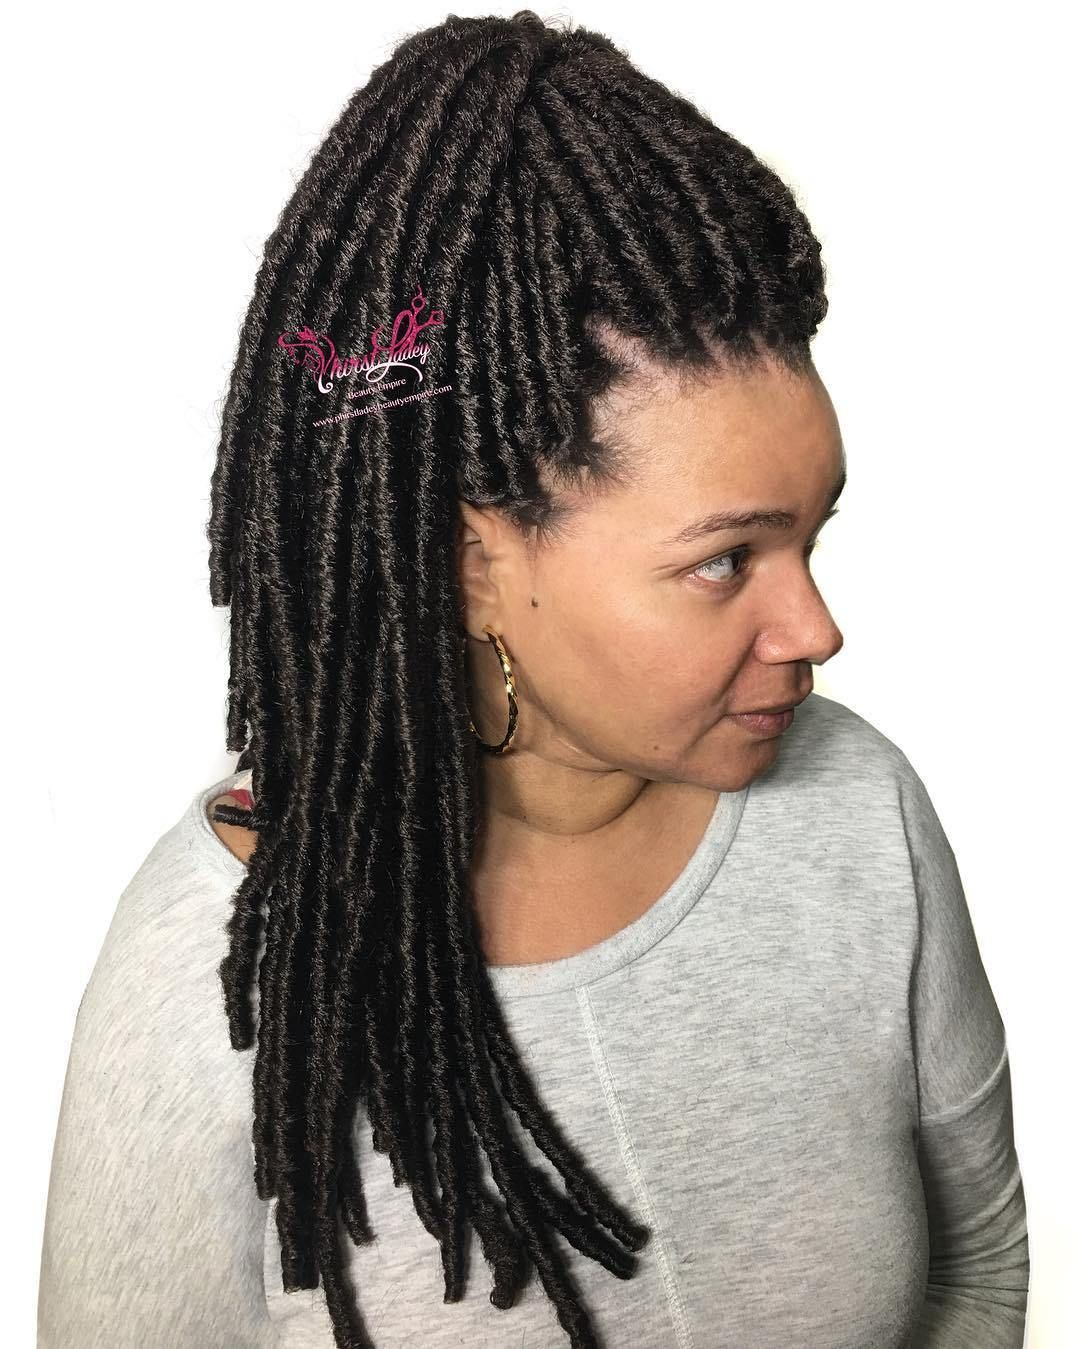 Faux Locs Hair Faux Locs Bob Faux Locs Styles Faux Locs Crochet